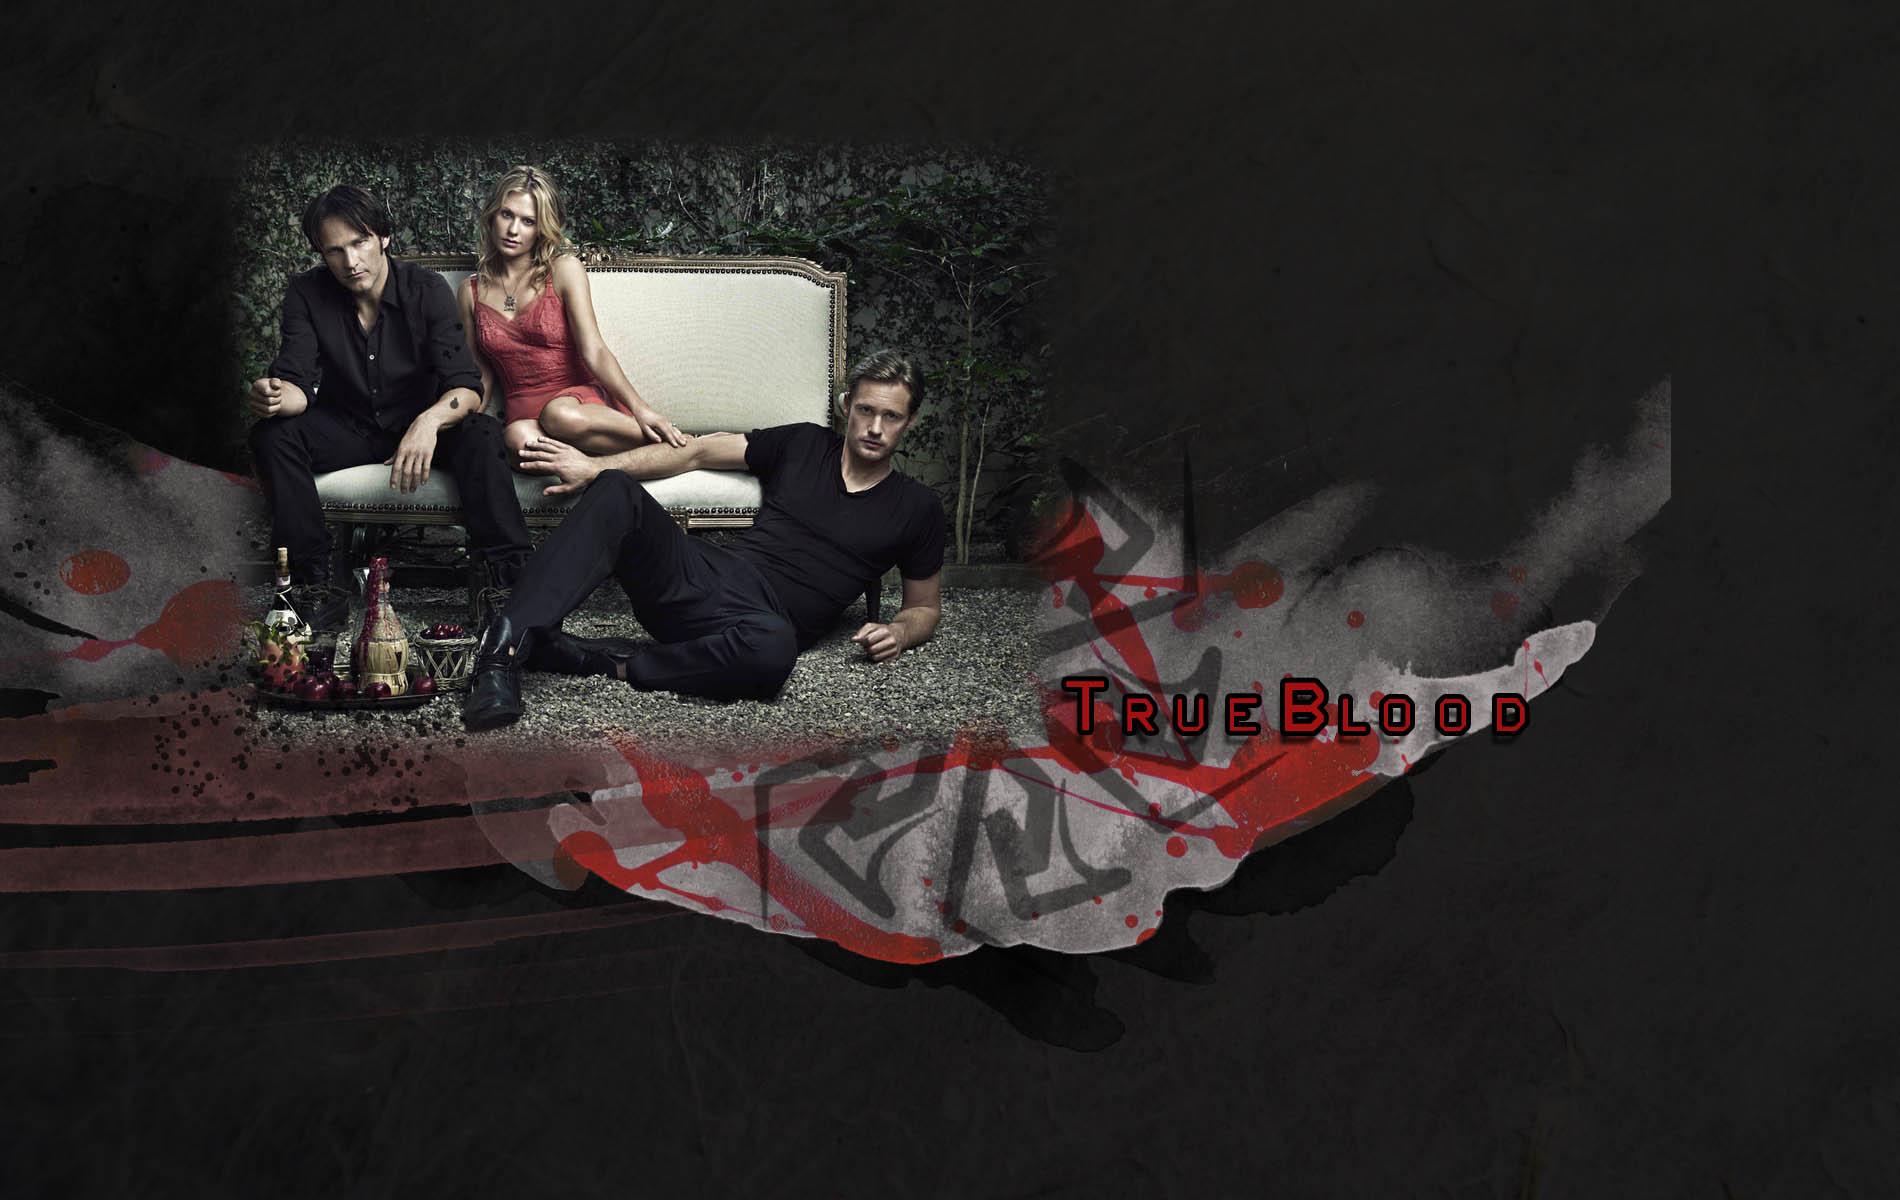 True Blood Wallpaper By Karatesoftballcheer5